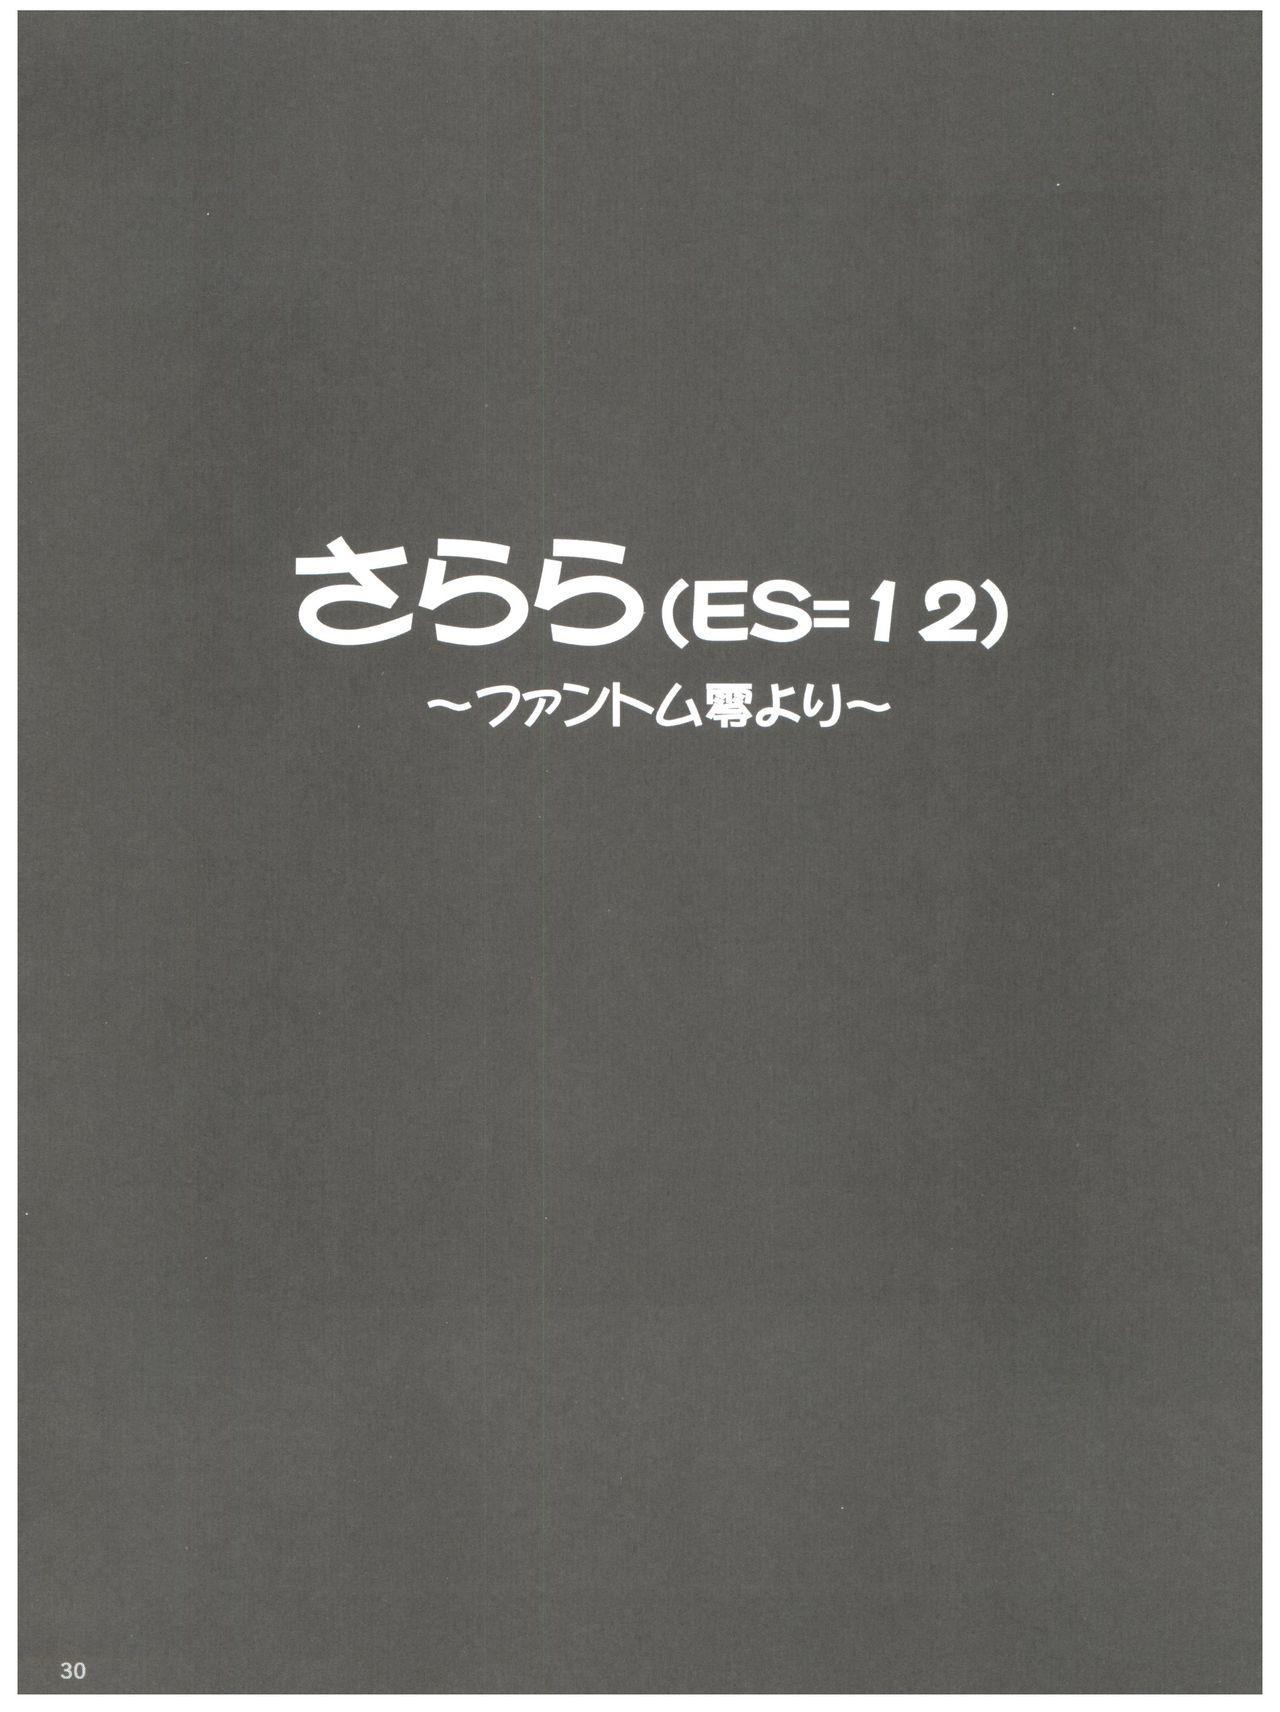 NONOYA Ryoujoku Sakuhinshuu 1 30